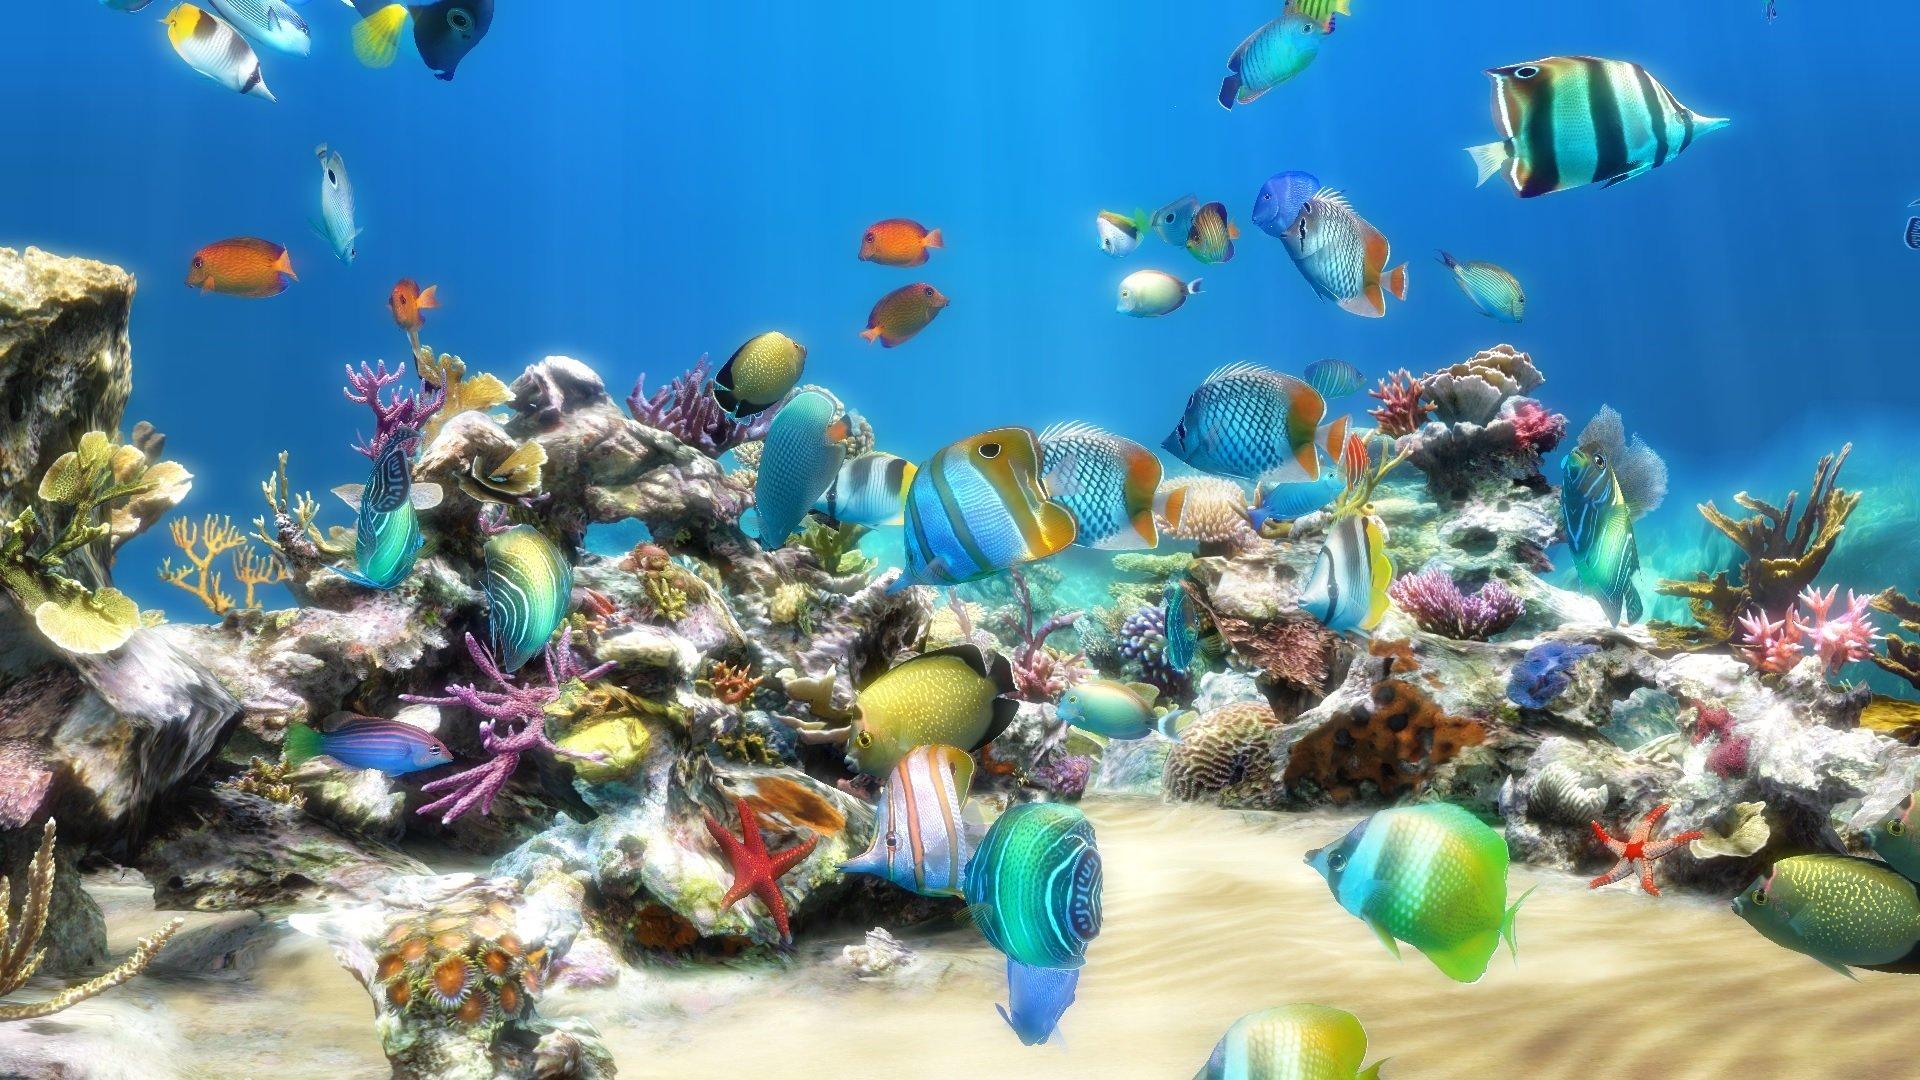 Fish aquarium for windows 7 screensaver - Fish Aquarium For Windows 7 Screensaver